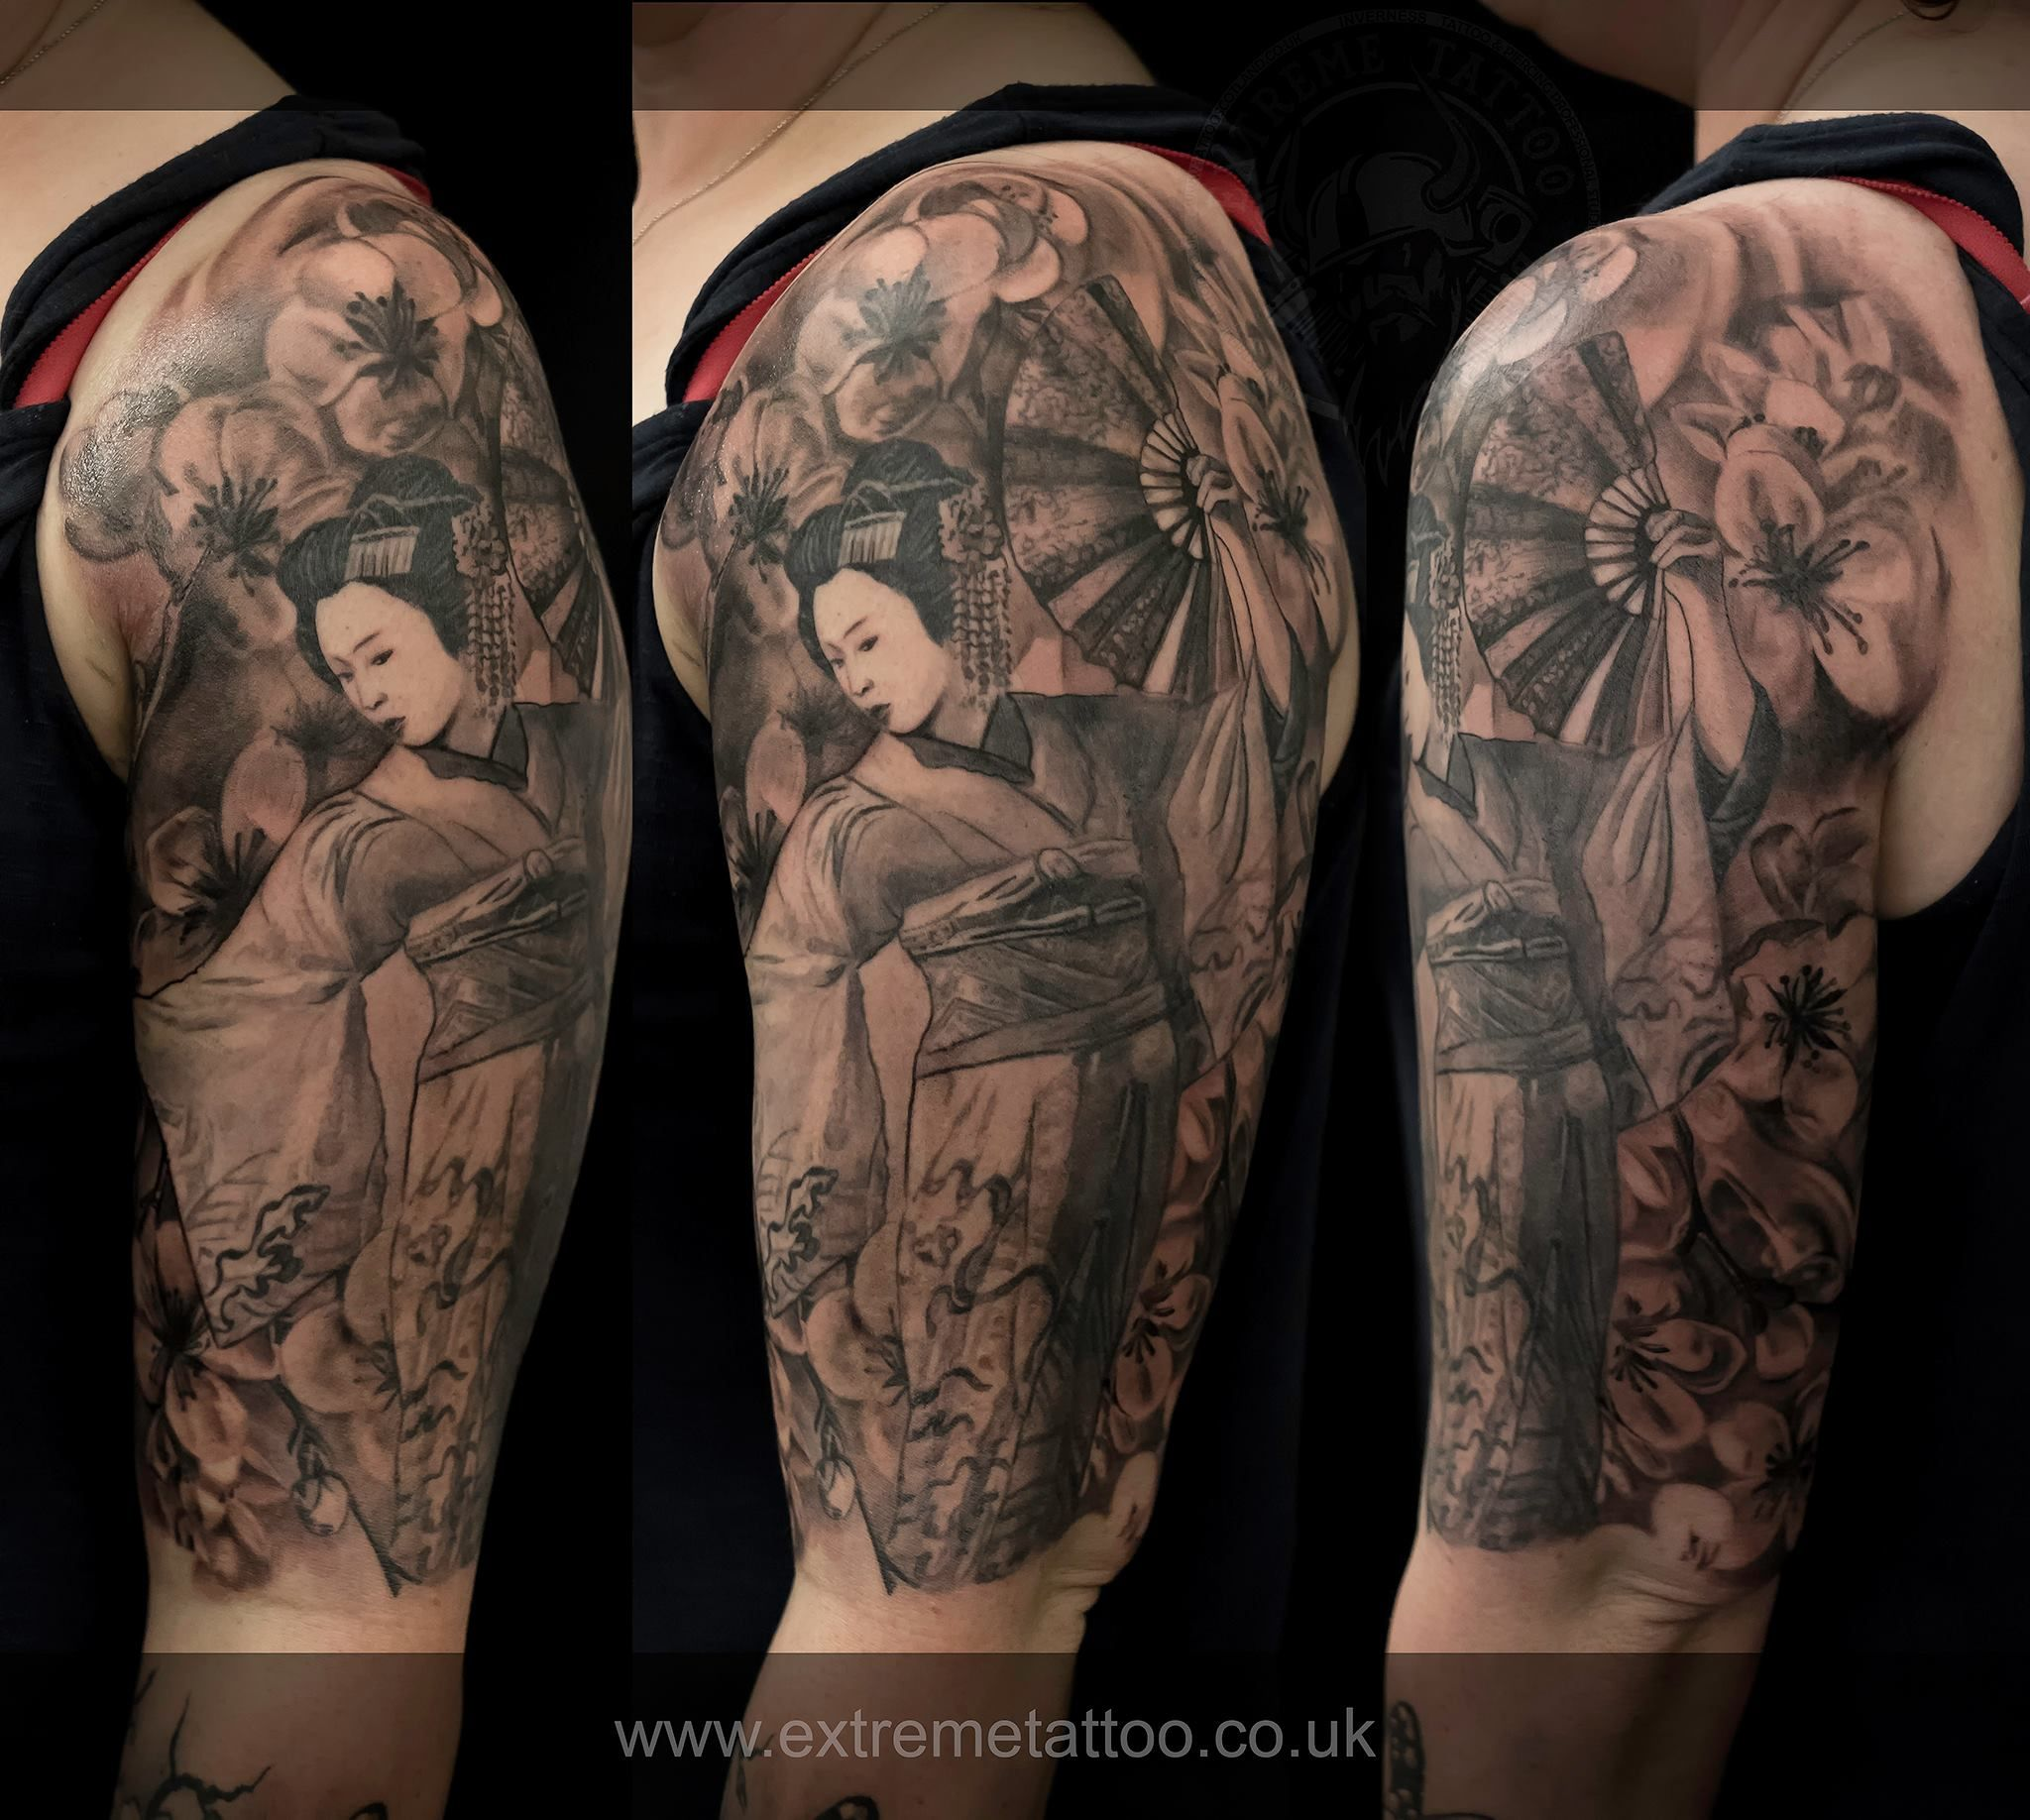 Geisha tattoo, done at Extreme Tattoo&Piercing Inverness